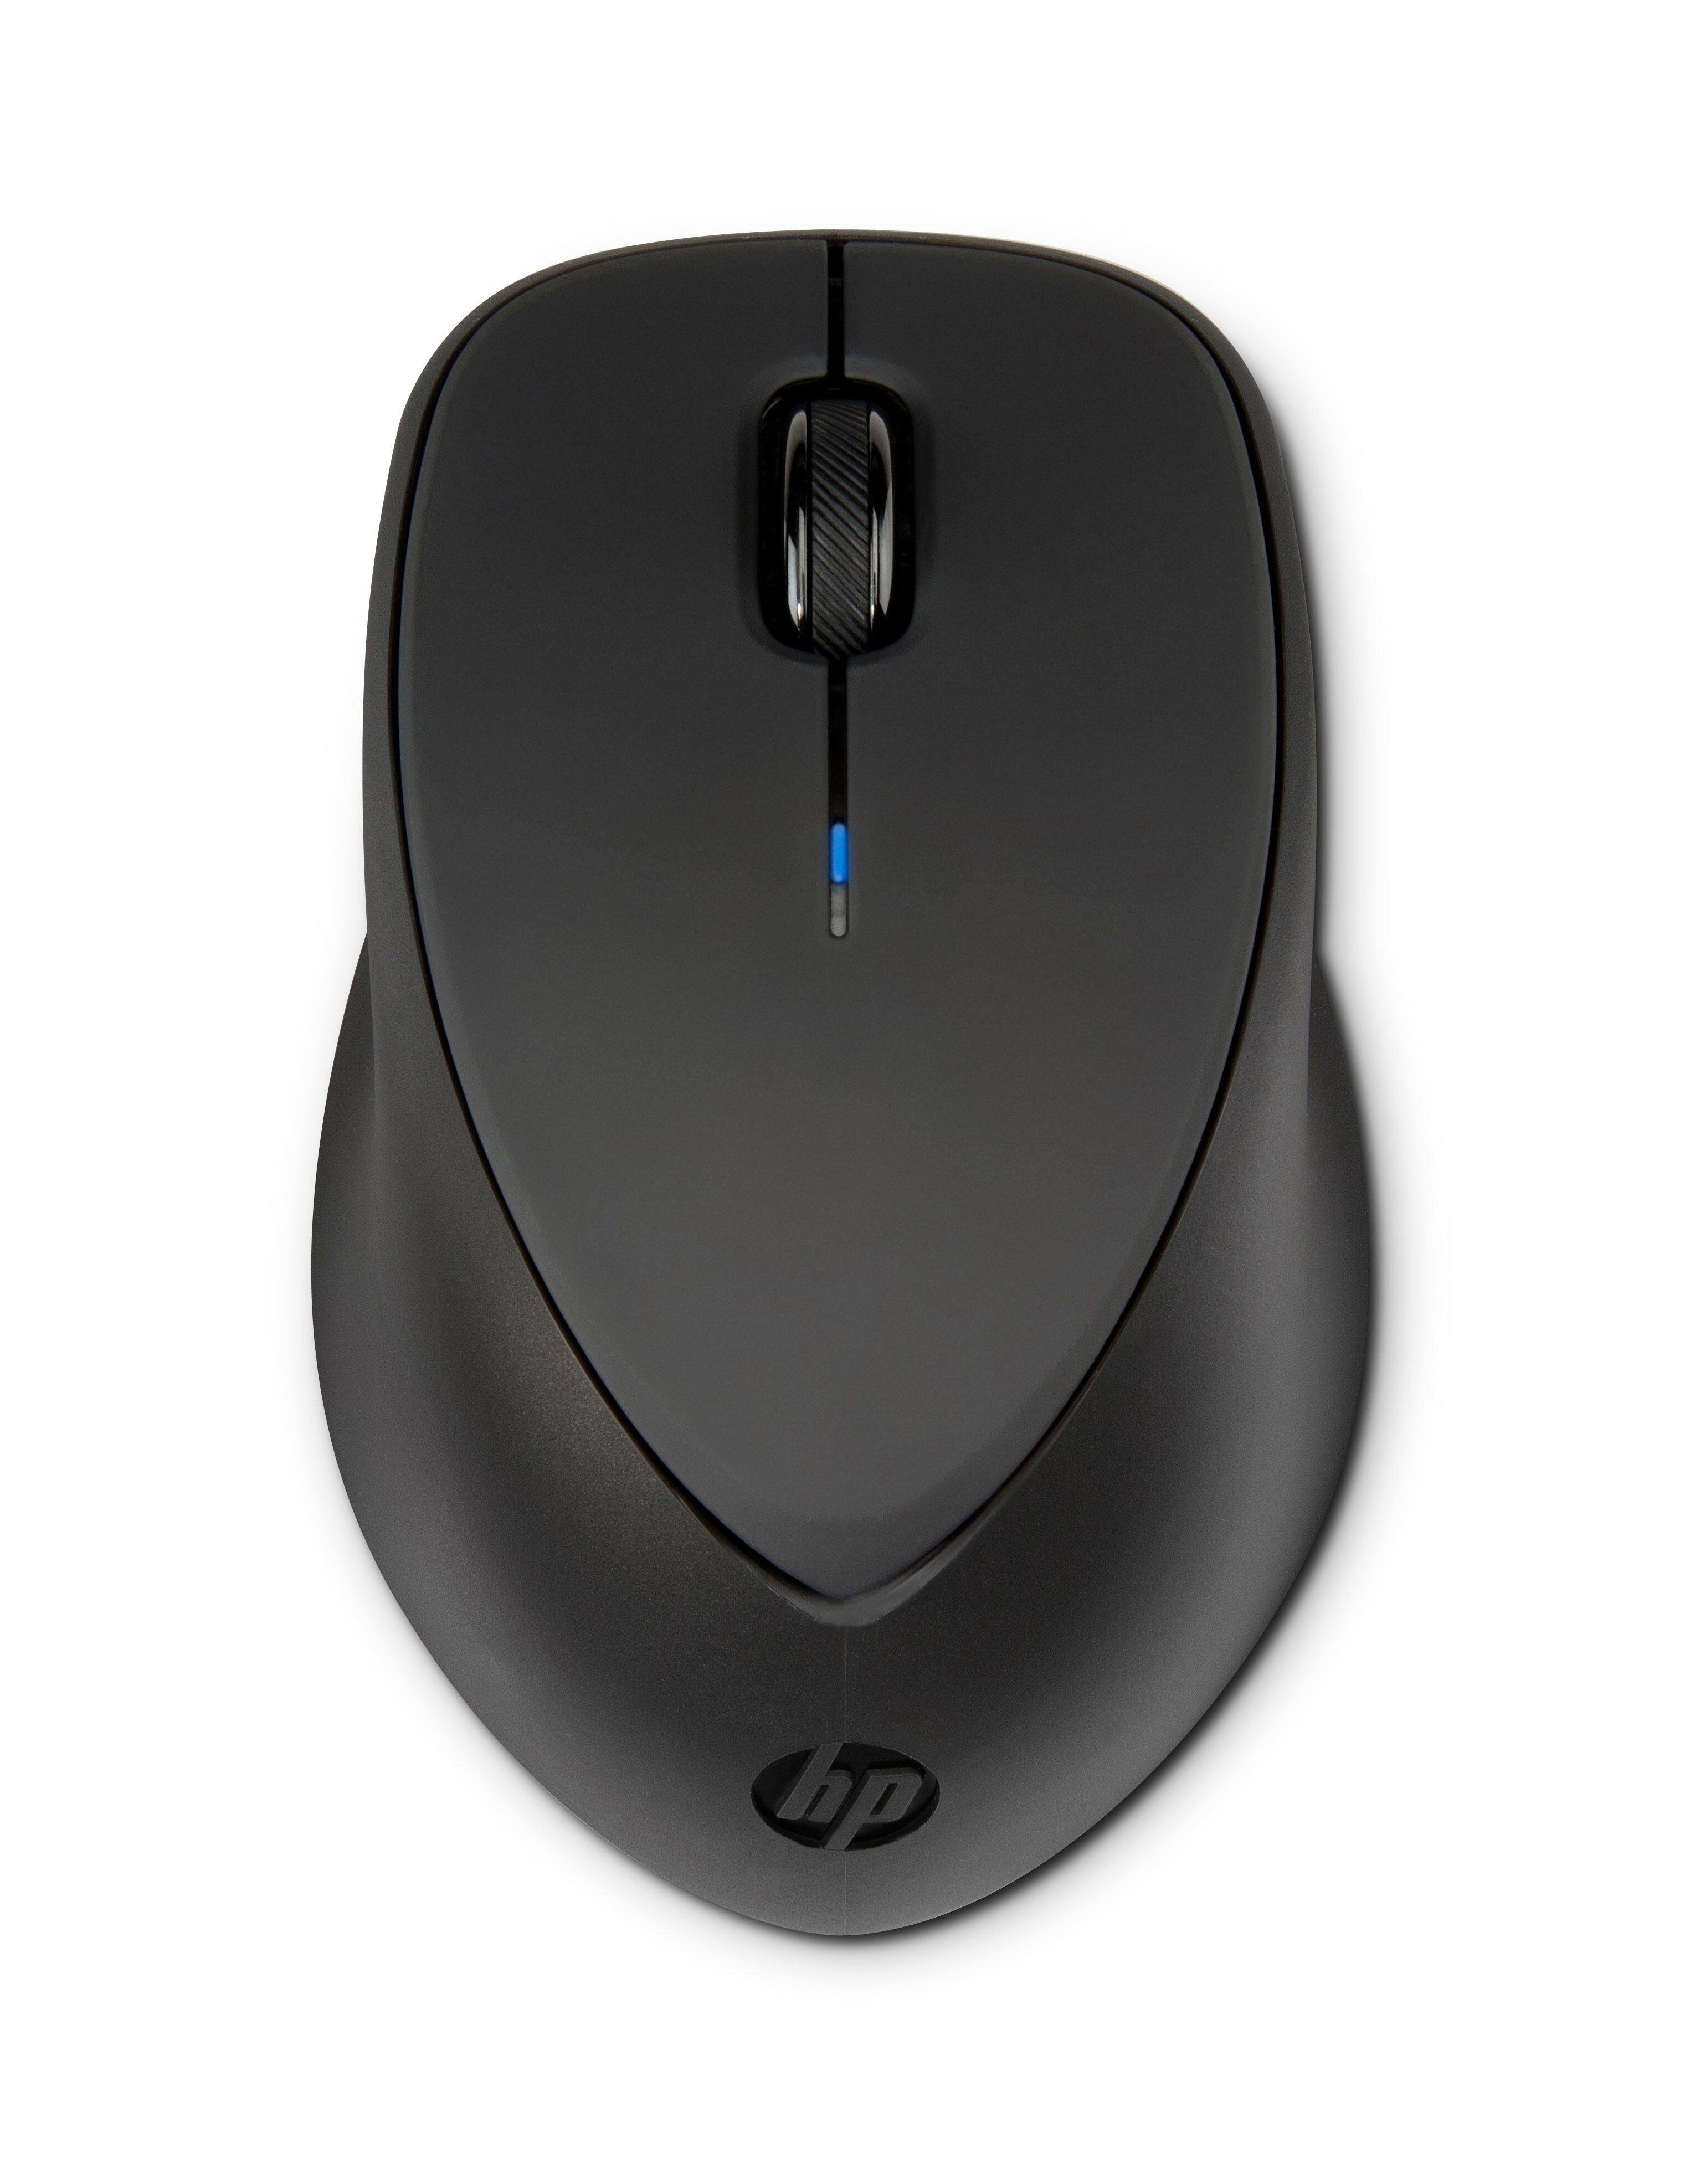 2488807-HP-X4000b-mouse-Bluetooth-Laser-1600-DPI-HPI-X4000b-Bluetooth-Mouse